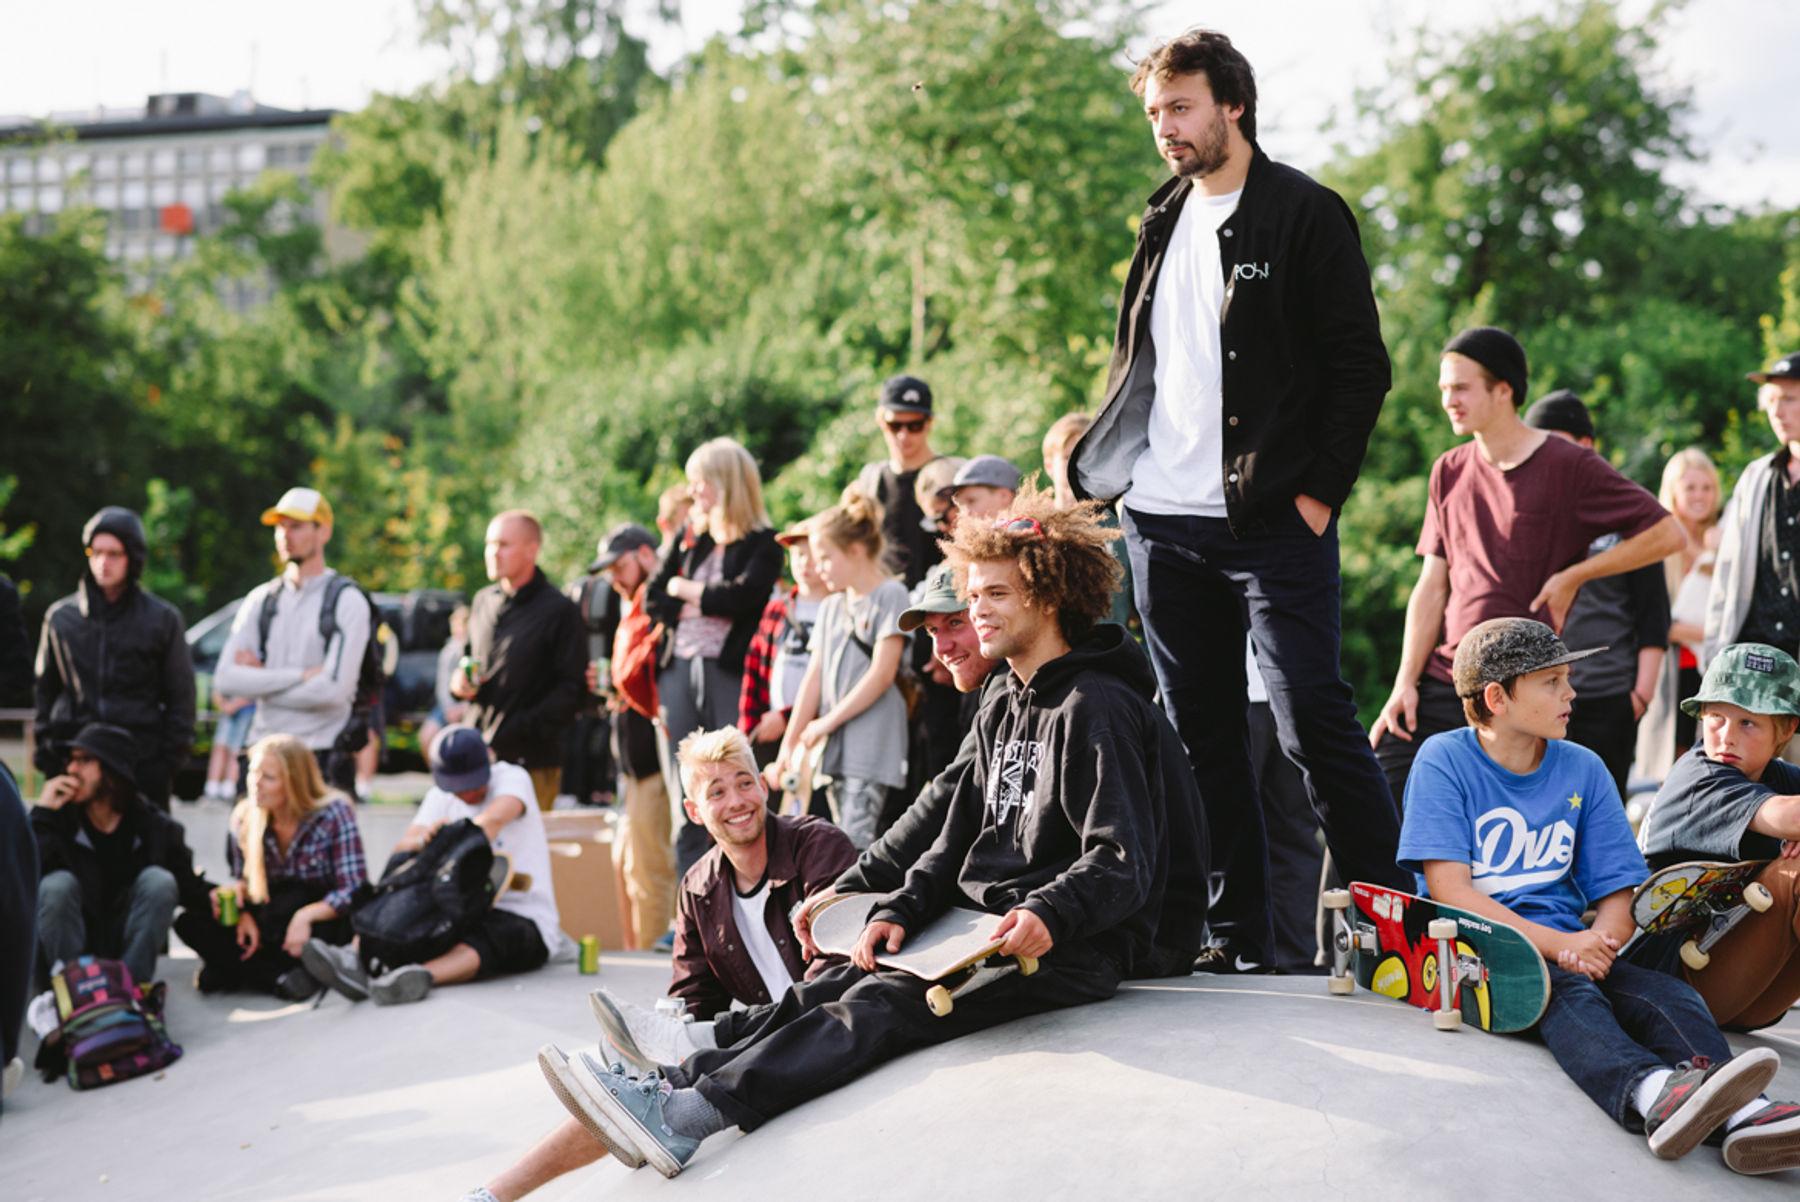 _IHC3227-Nassim-Guammaz-Alex-Pires-Nike-SB-Copenhagen-Open-Day-1-Faelledparken-July-2015-Photographer-Maksim-Kalanep